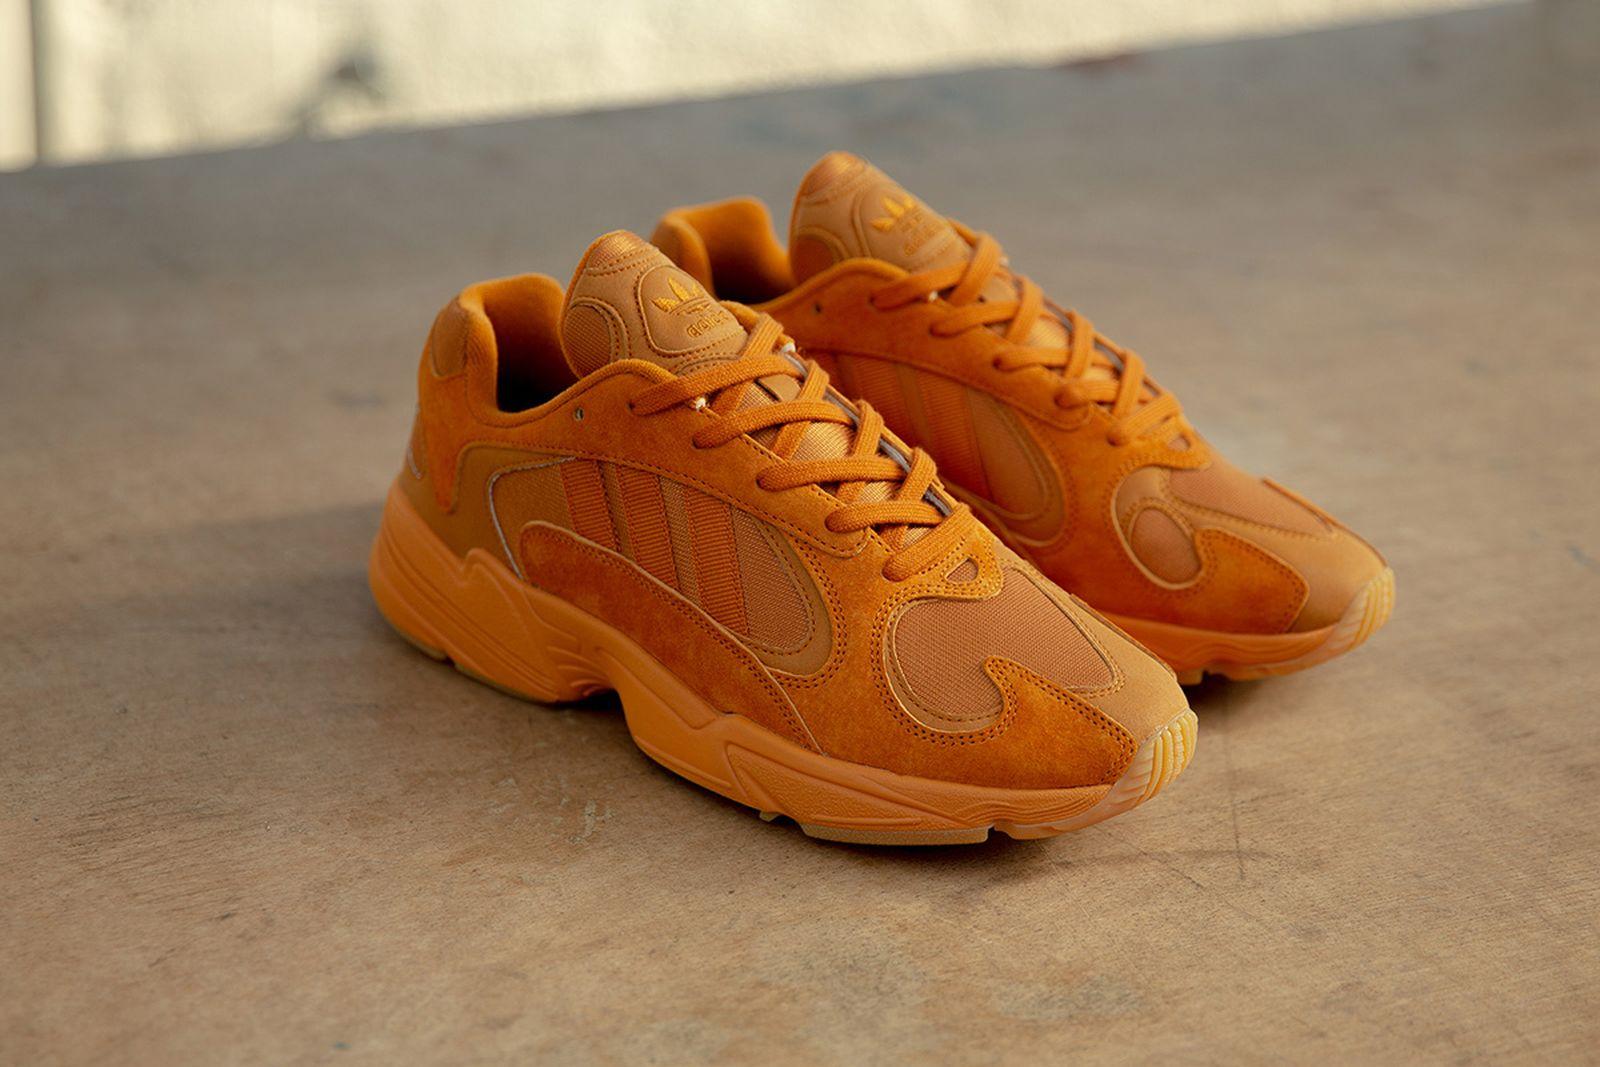 size adidas originals yung 1 craft ochre release date price Yung-1